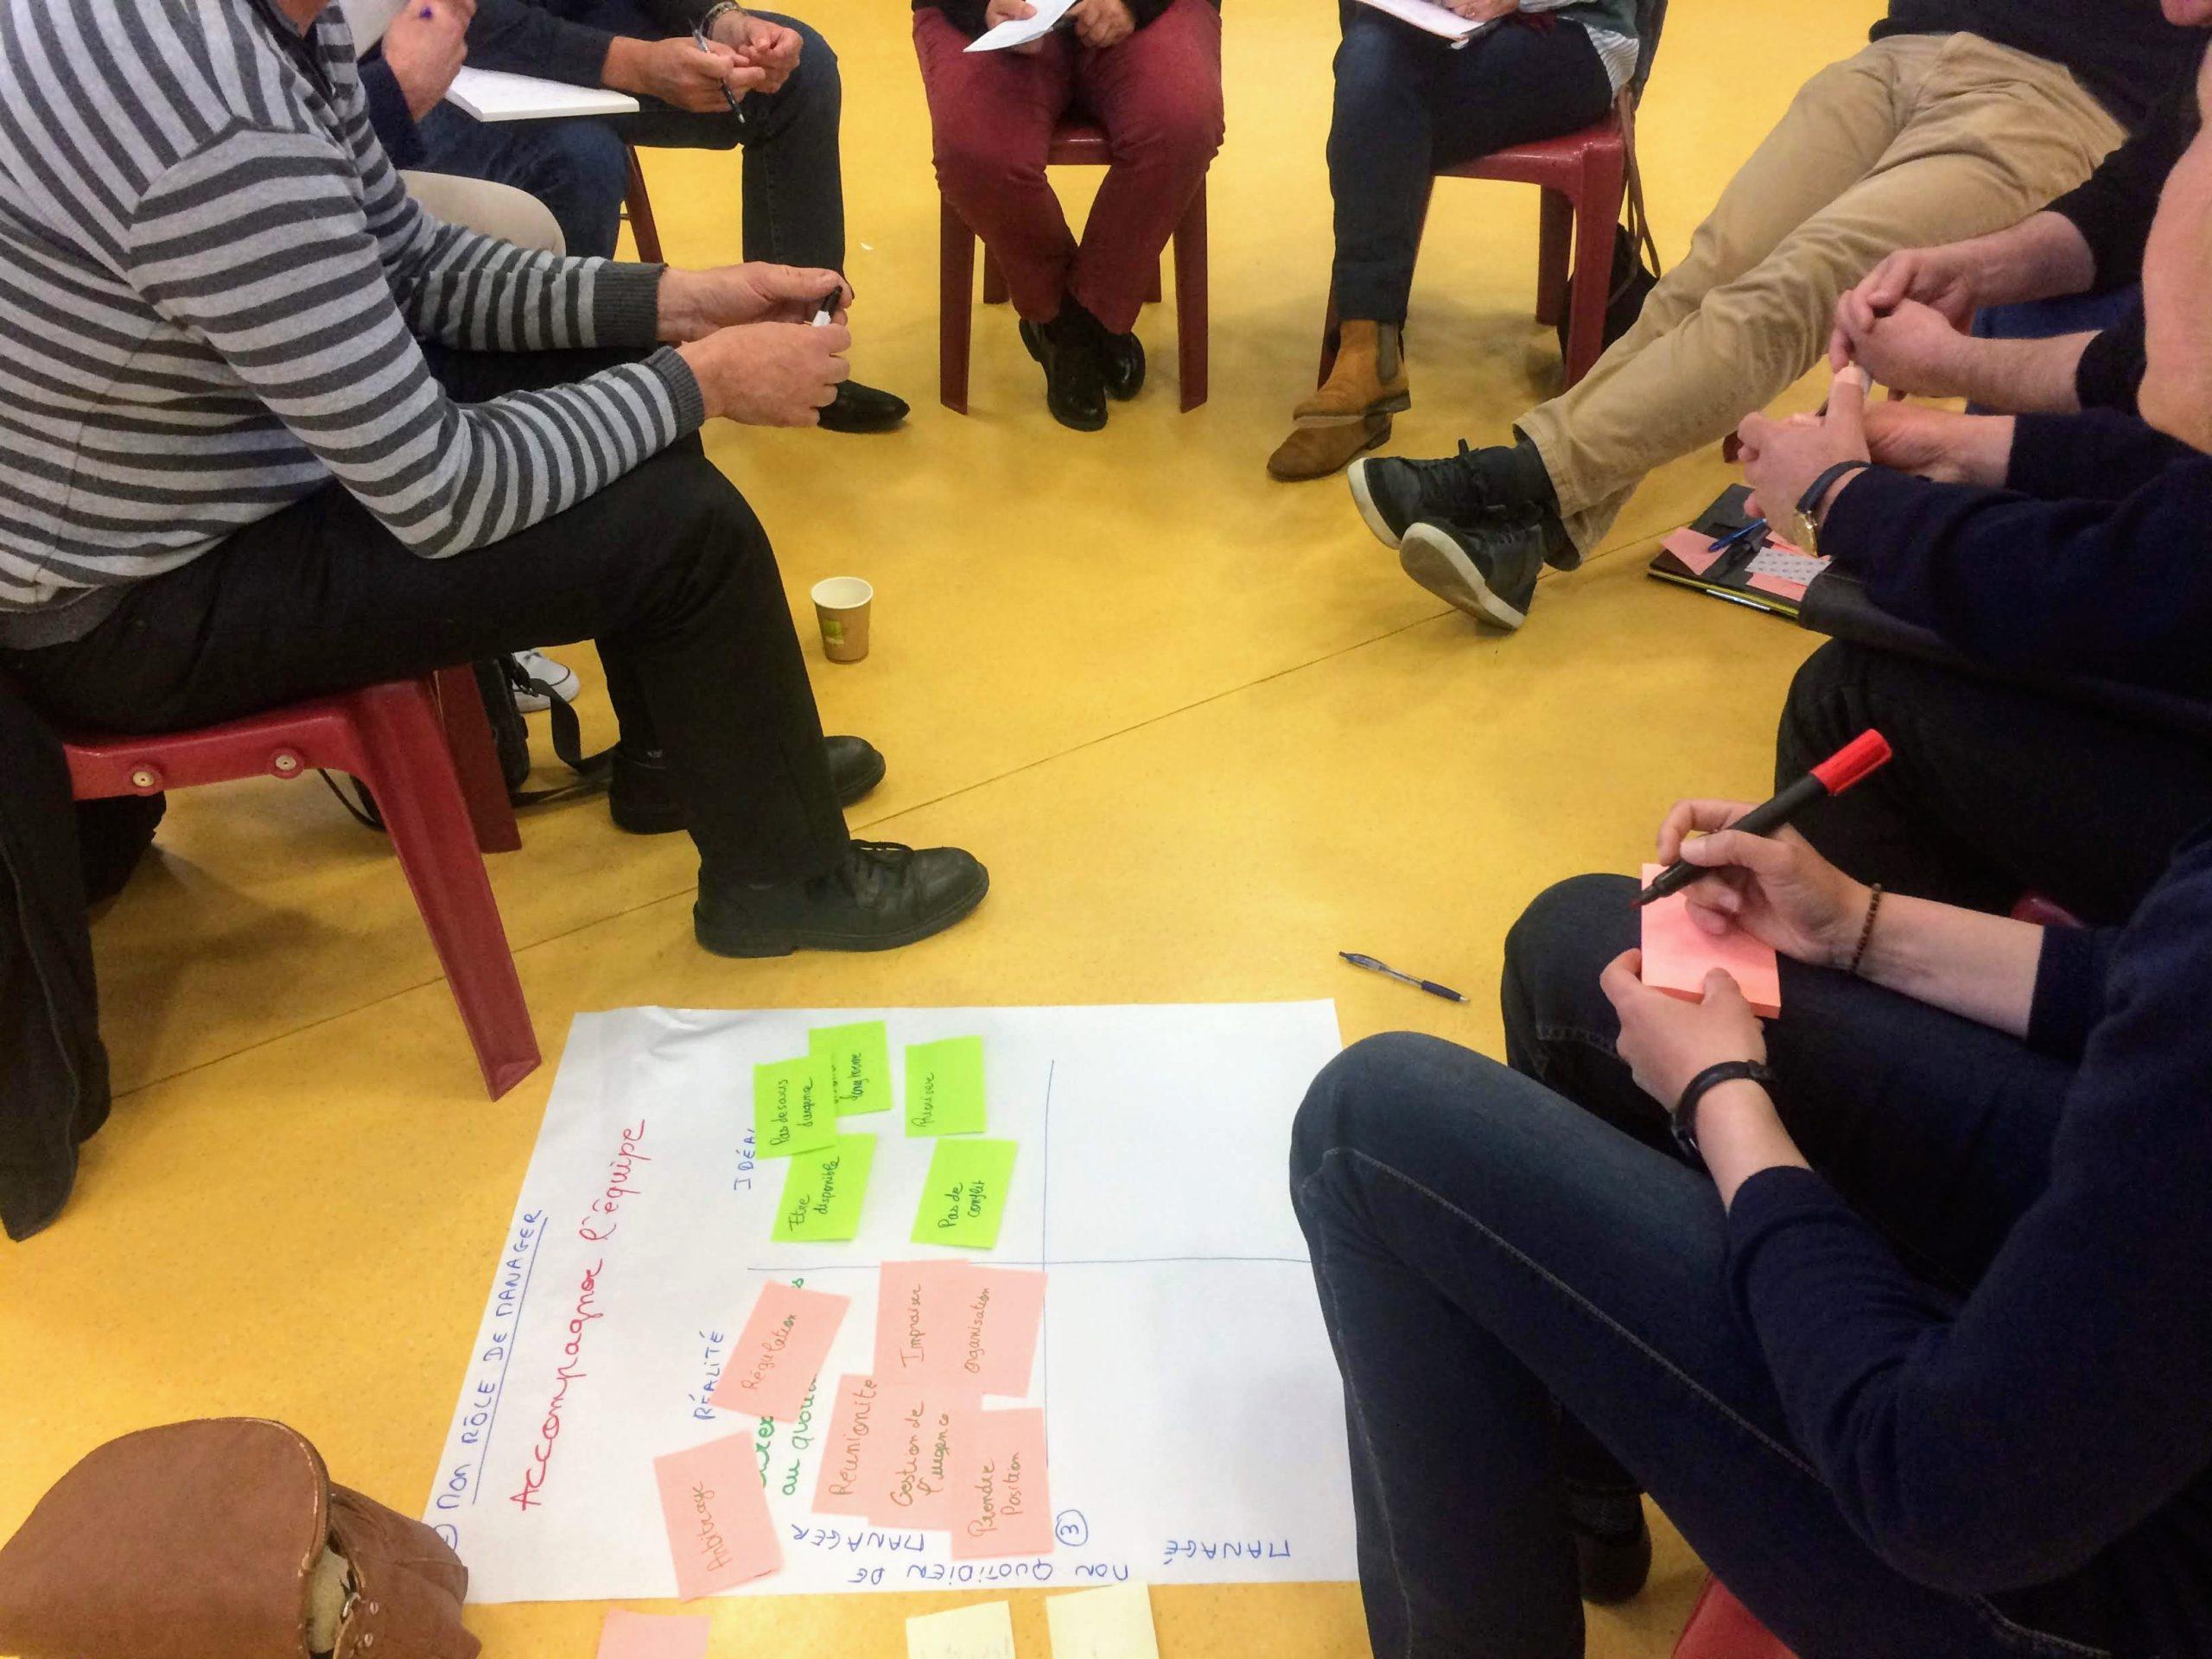 Séminaire Management Niort - Humanance